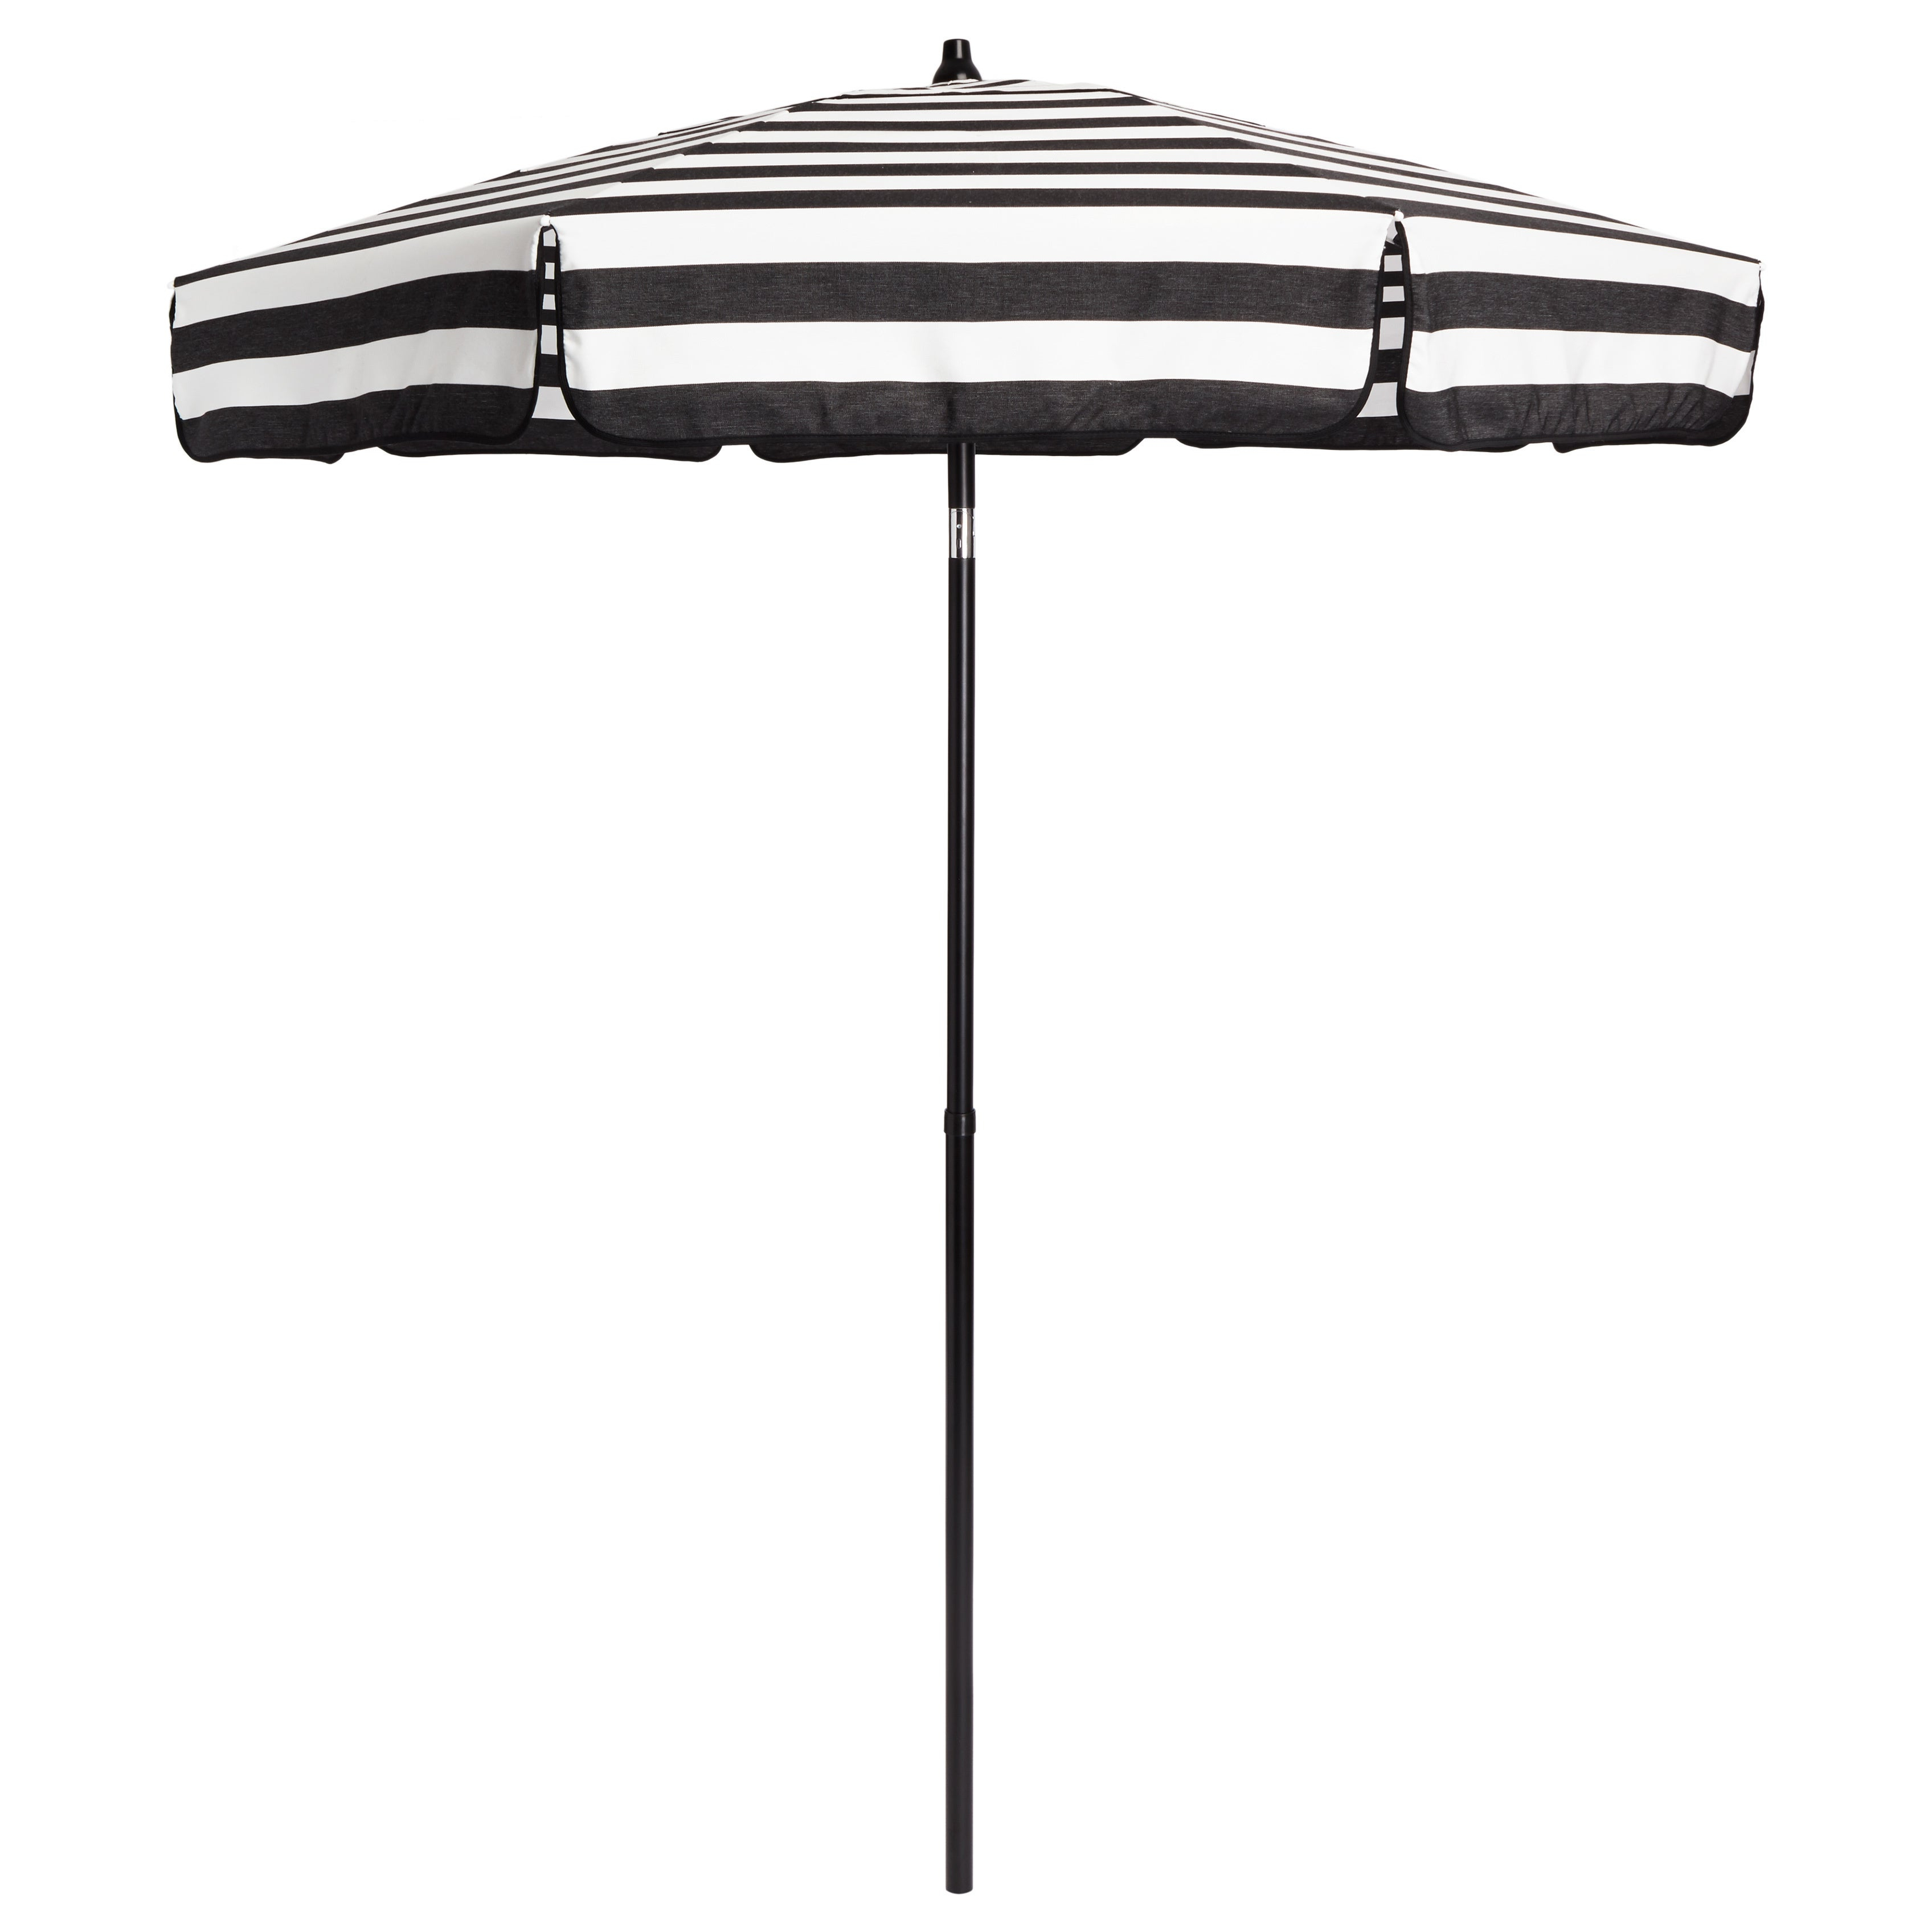 Italian Bistro 6 Foot Acrylic Striped Patio Umbrella Regarding Well Liked Italian Drape Umbrellas (View 7 of 20)